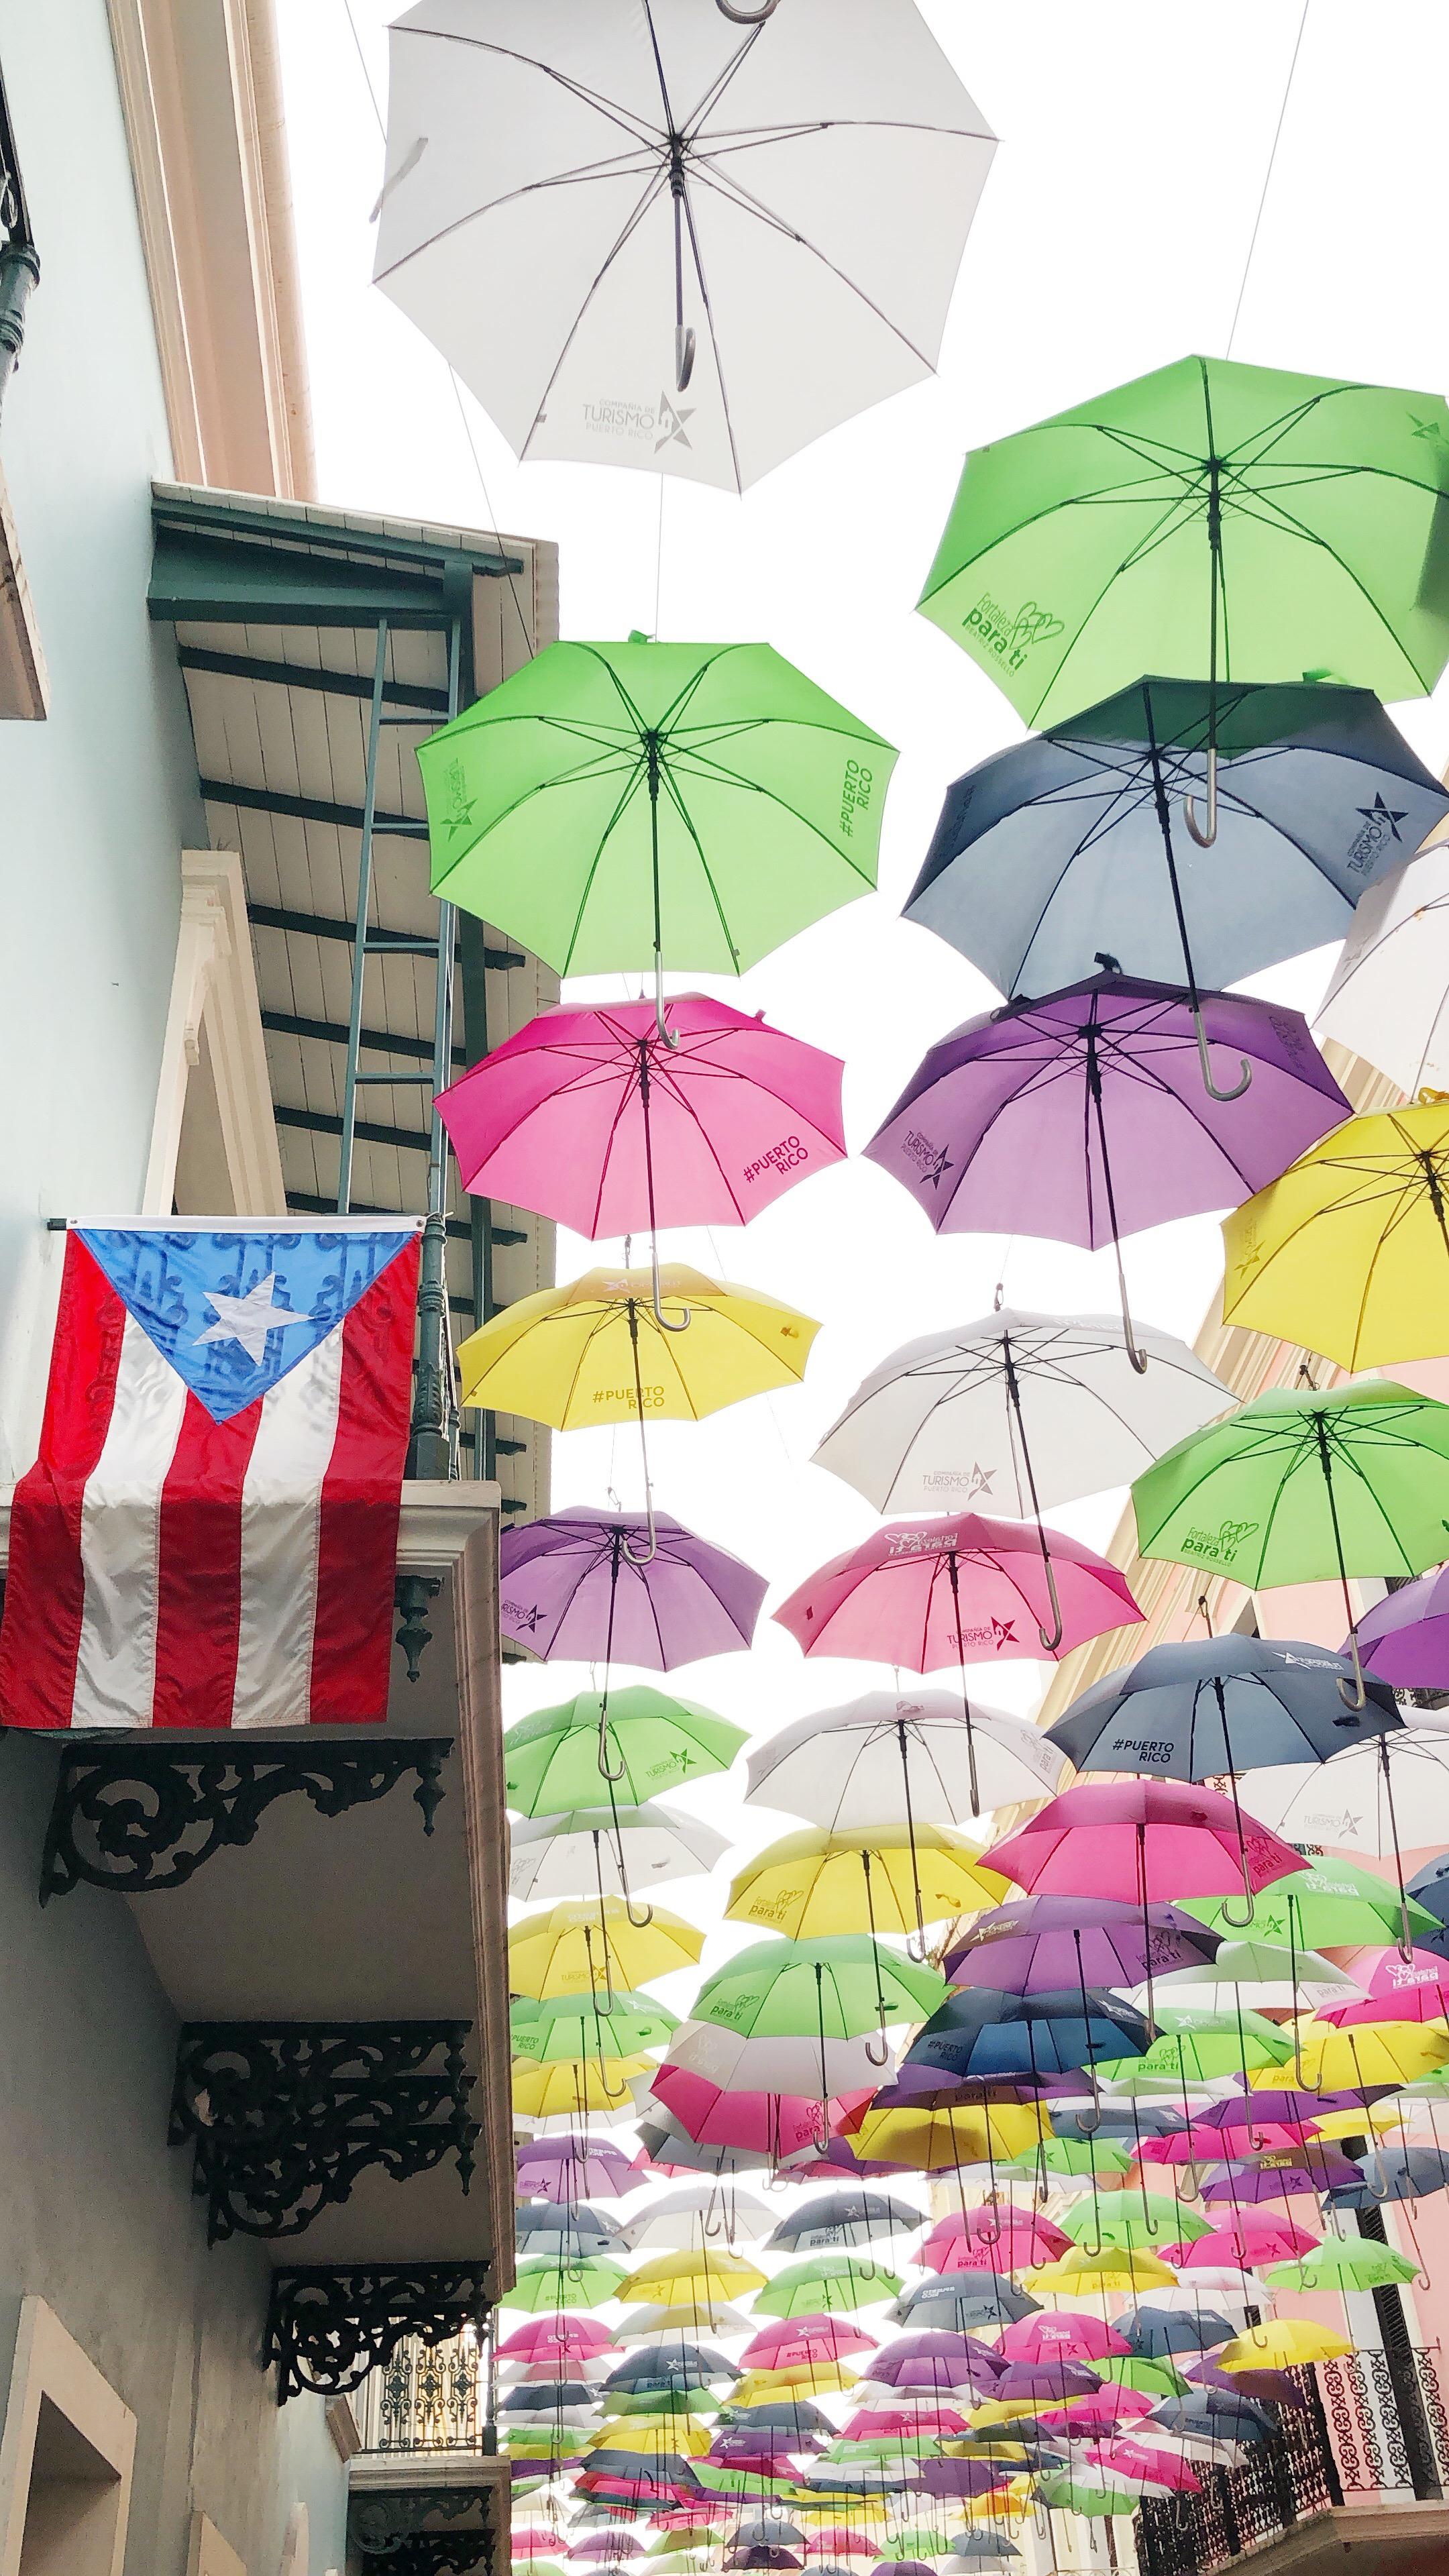 Umbrella Street (aka Fortaleza Street) in Old San Juan, Puerto Rico.